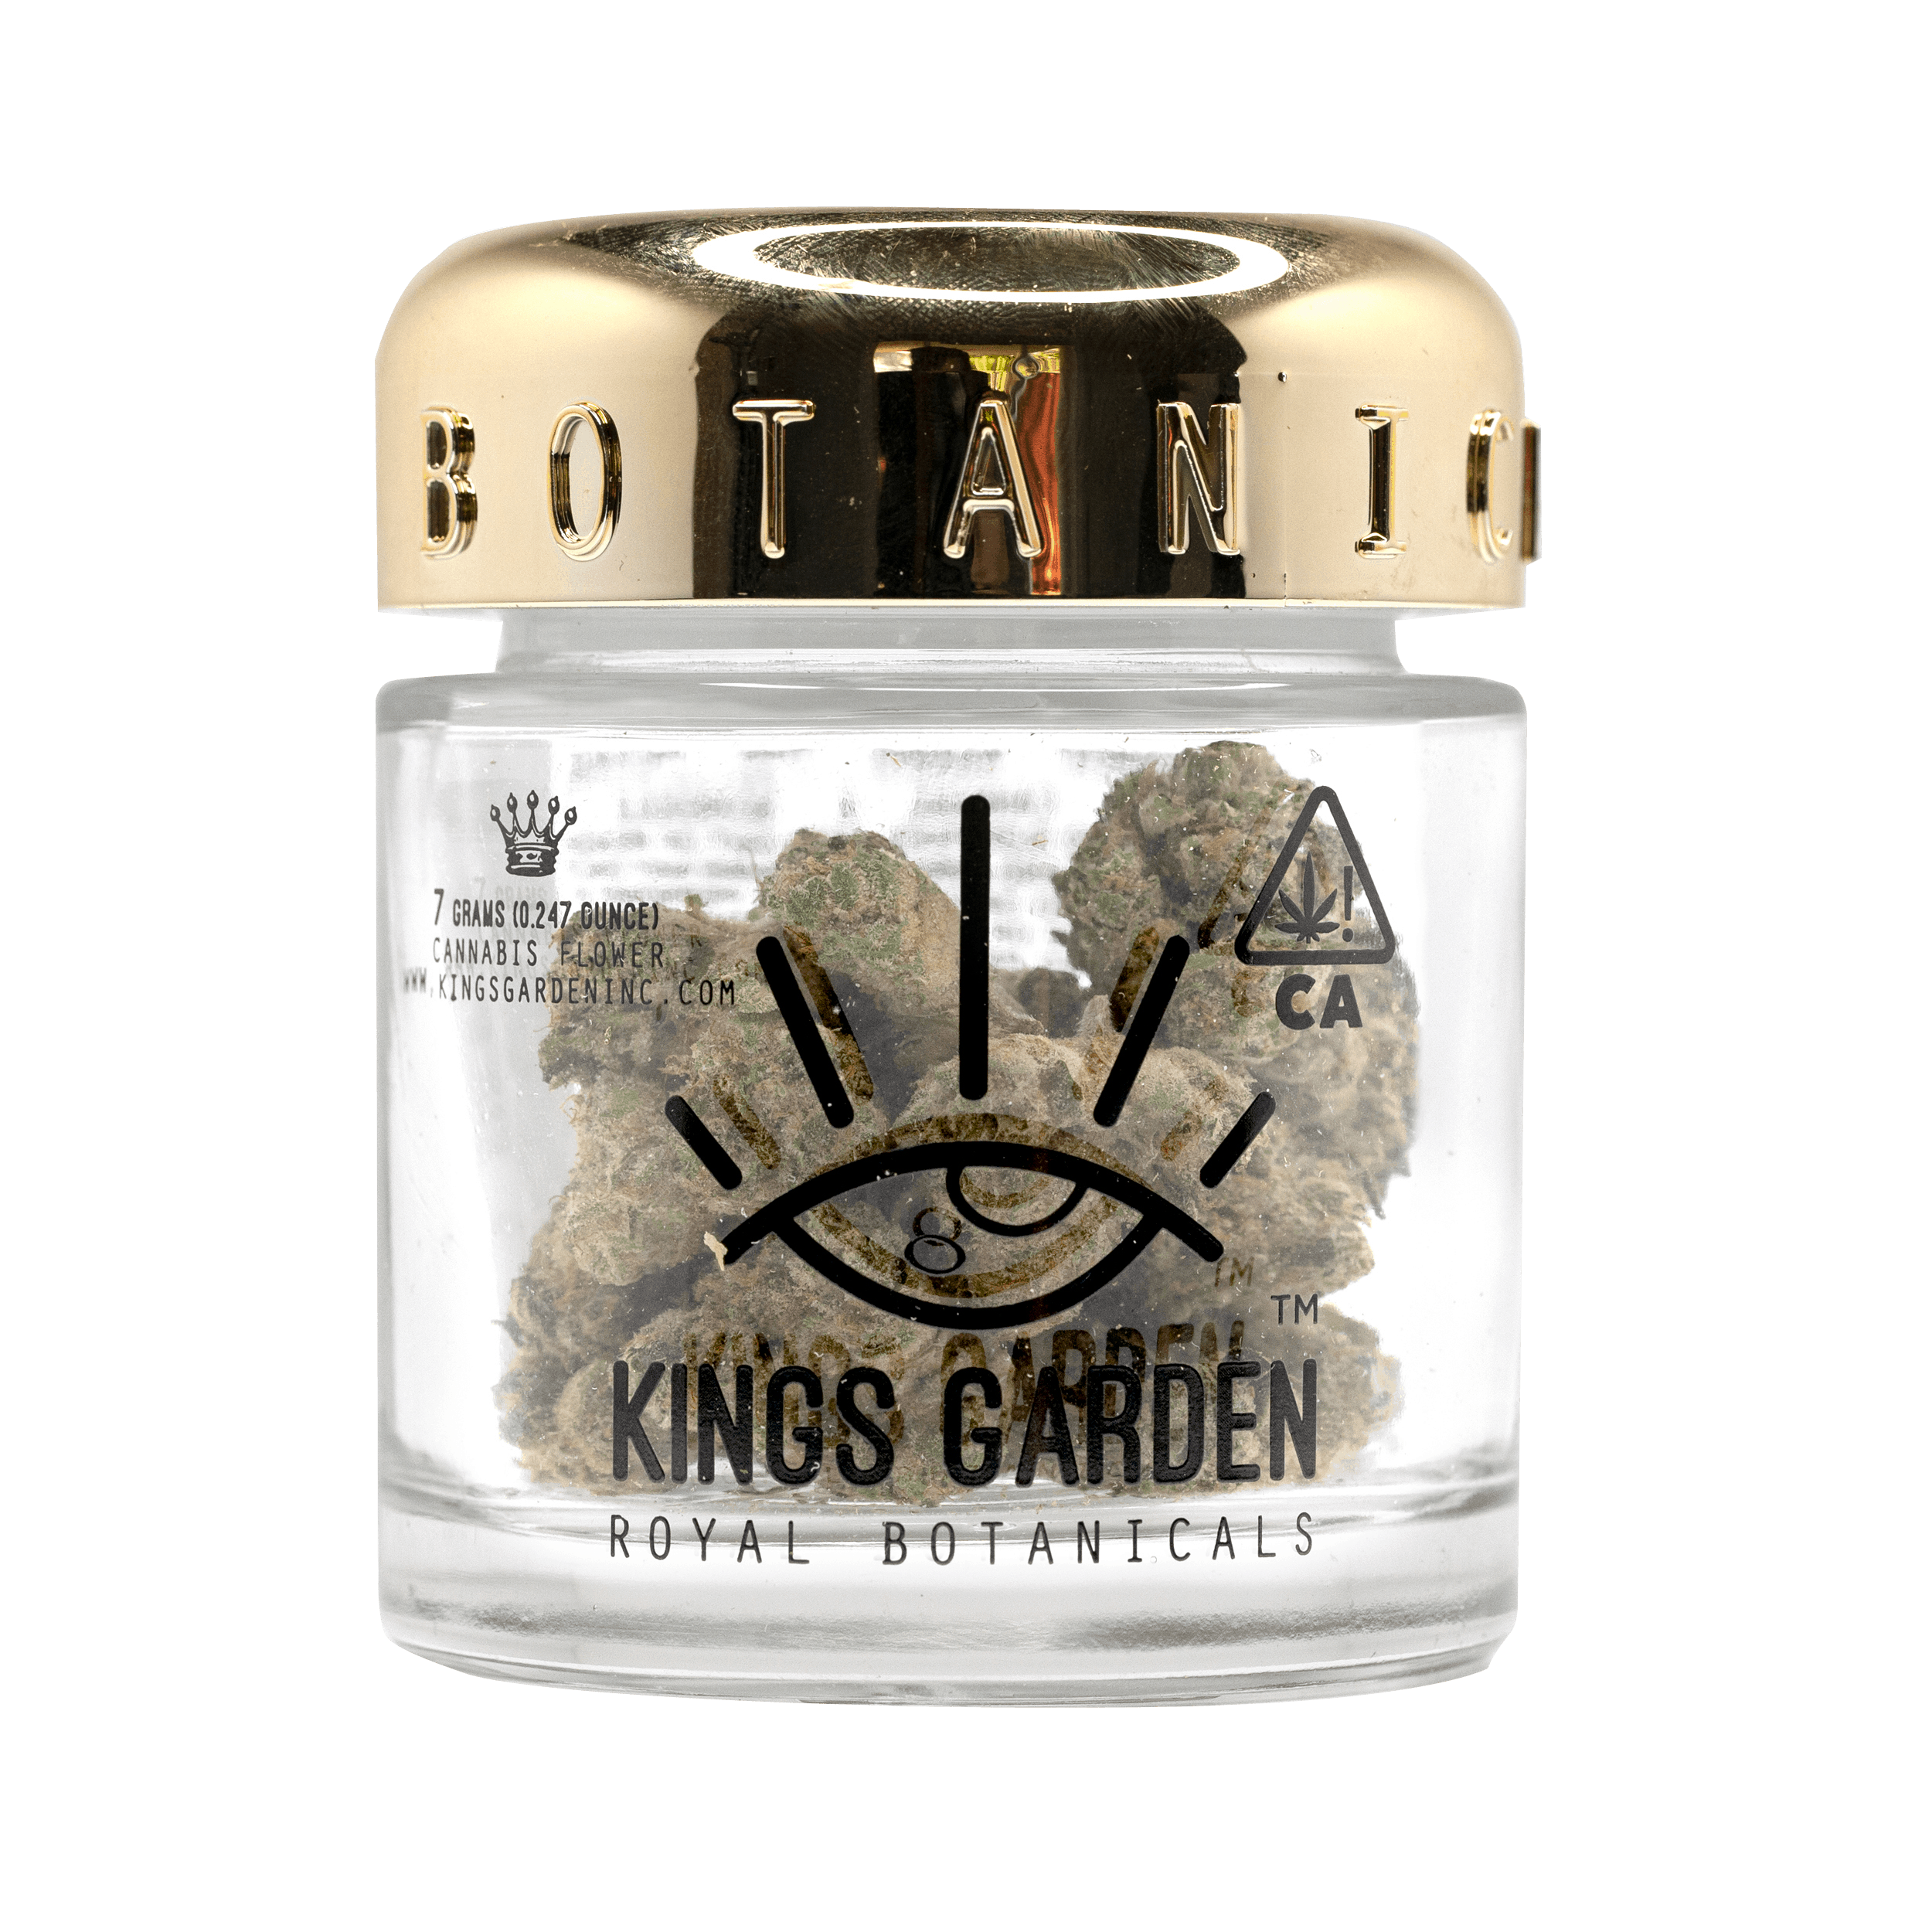 Kings Garden Review